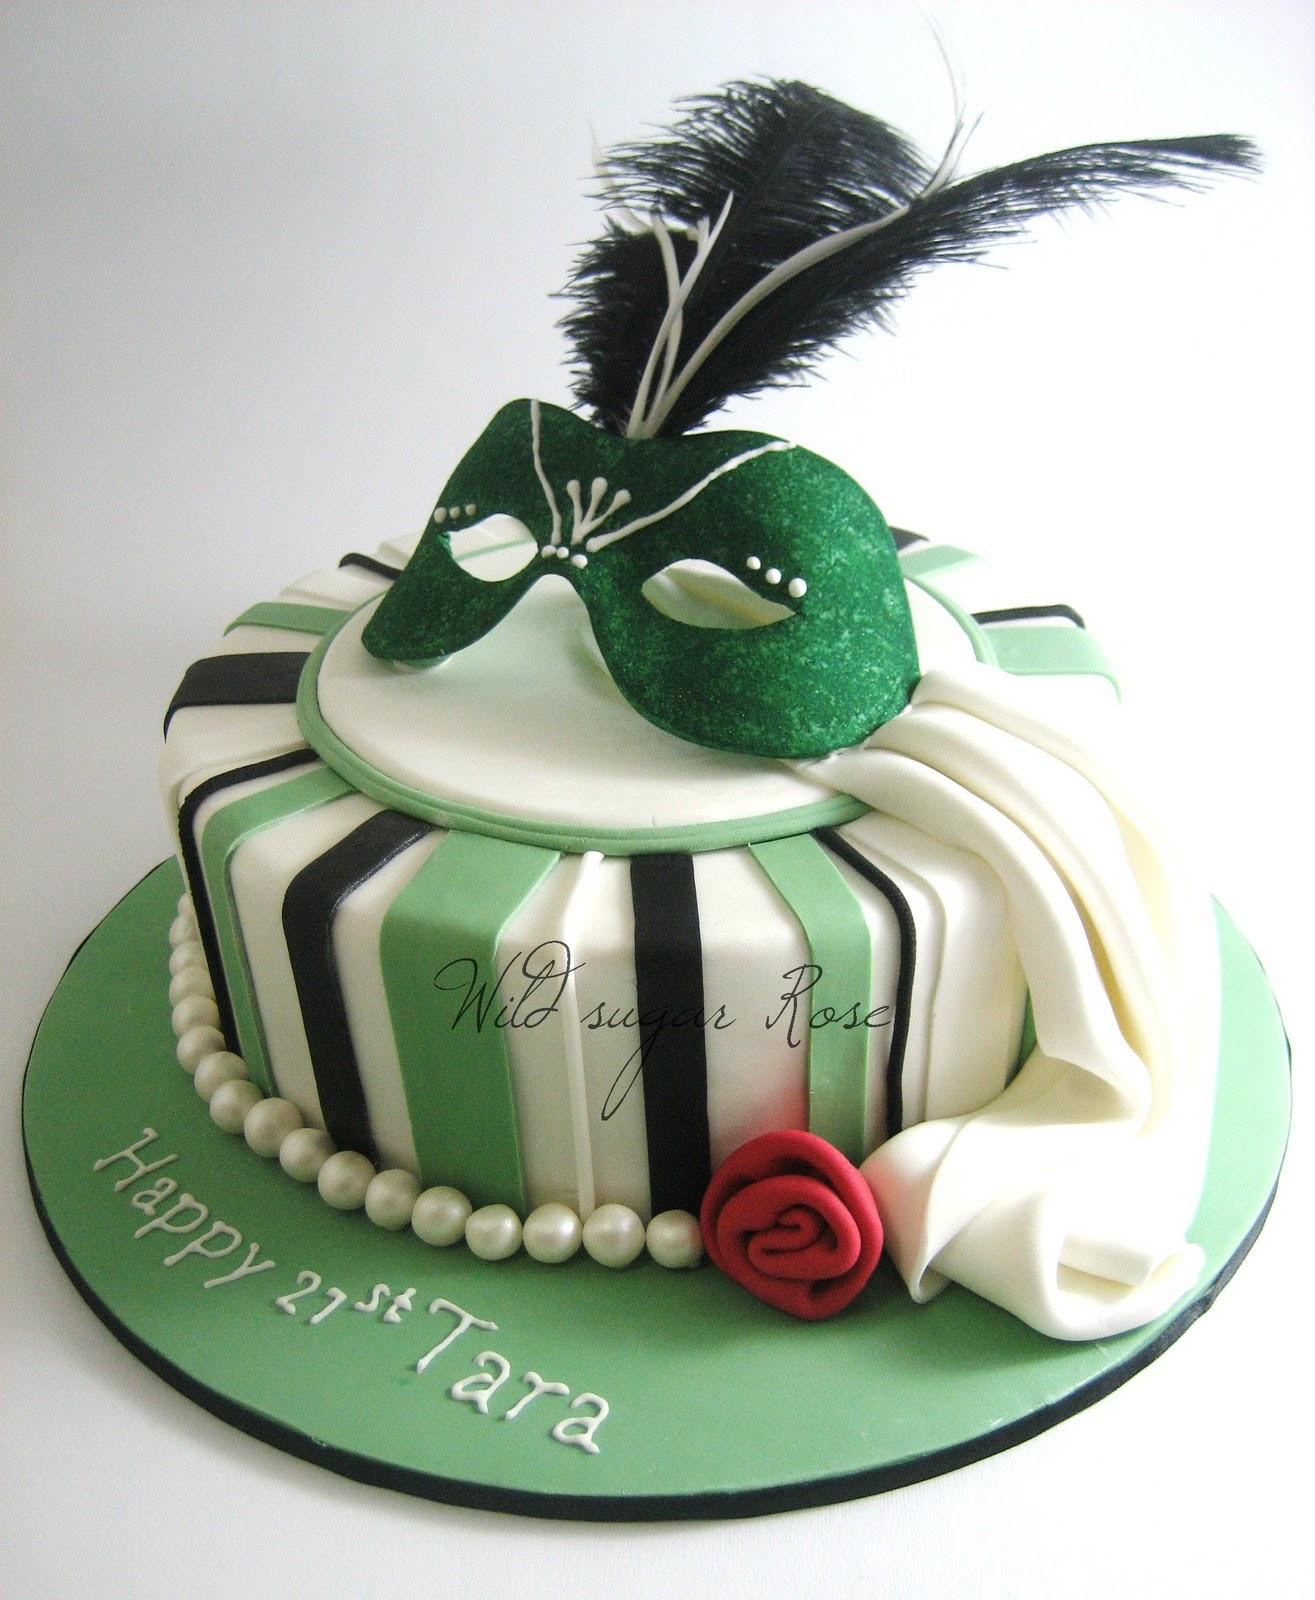 Cake Design Ball : Wild sugar Rose - wedding cakes, cupcakes and cake ...